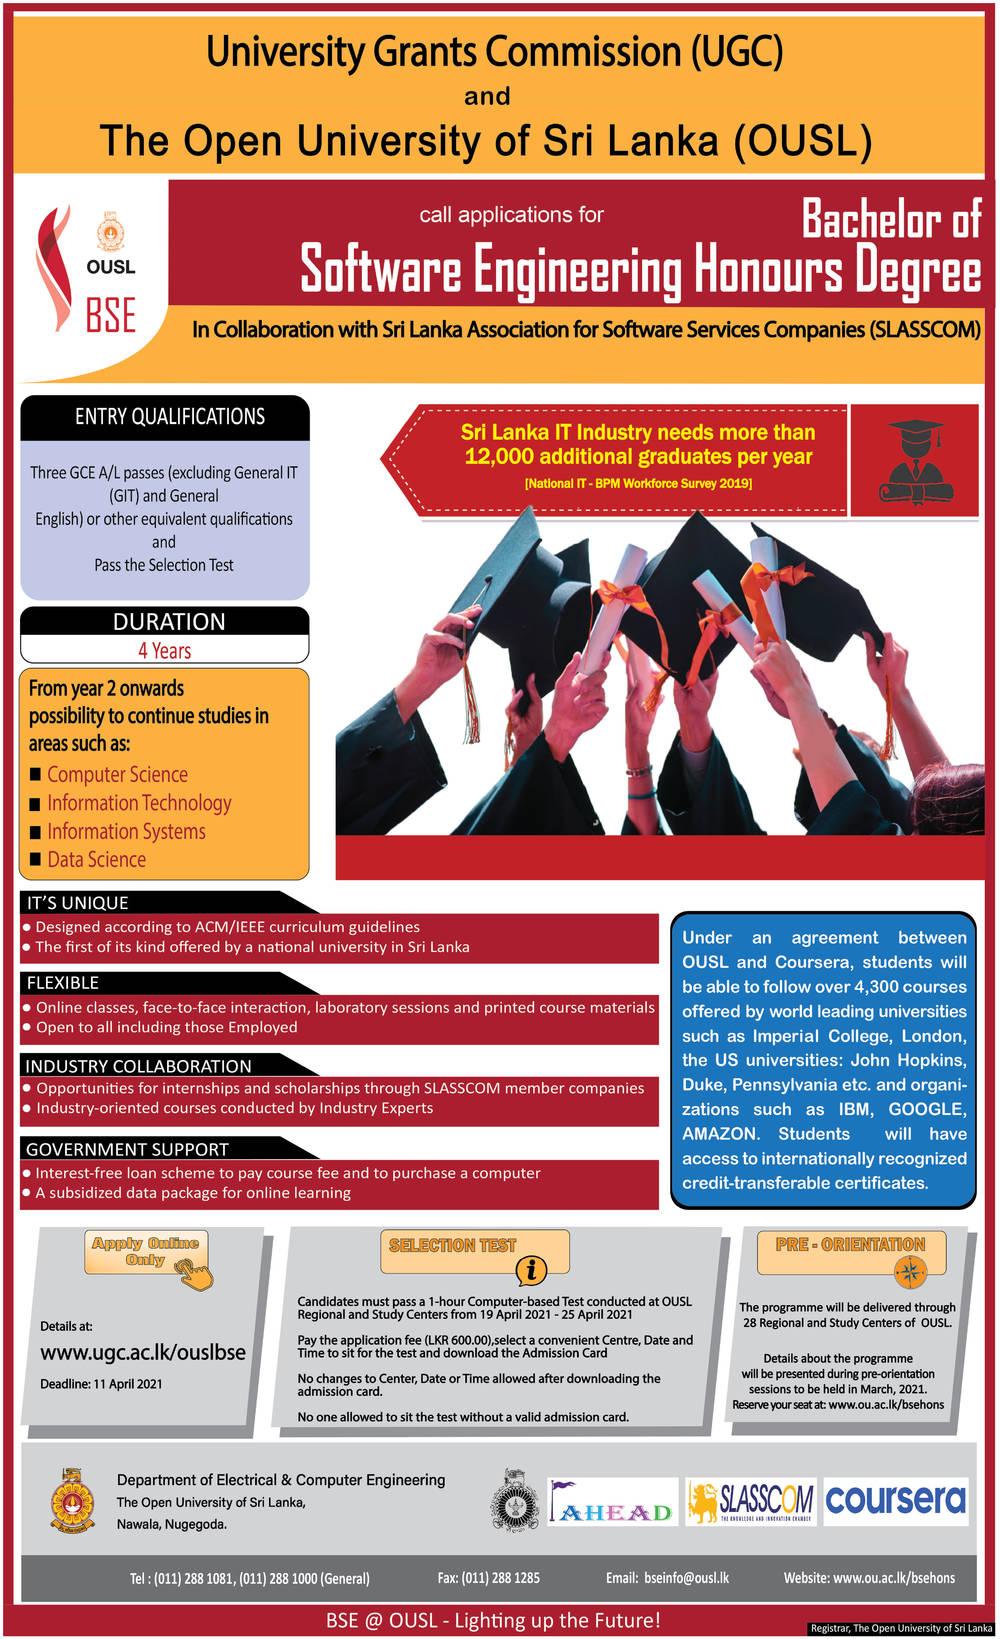 Bachelor of Software Engineering Honours Degree - The Open University of Sri Lanka